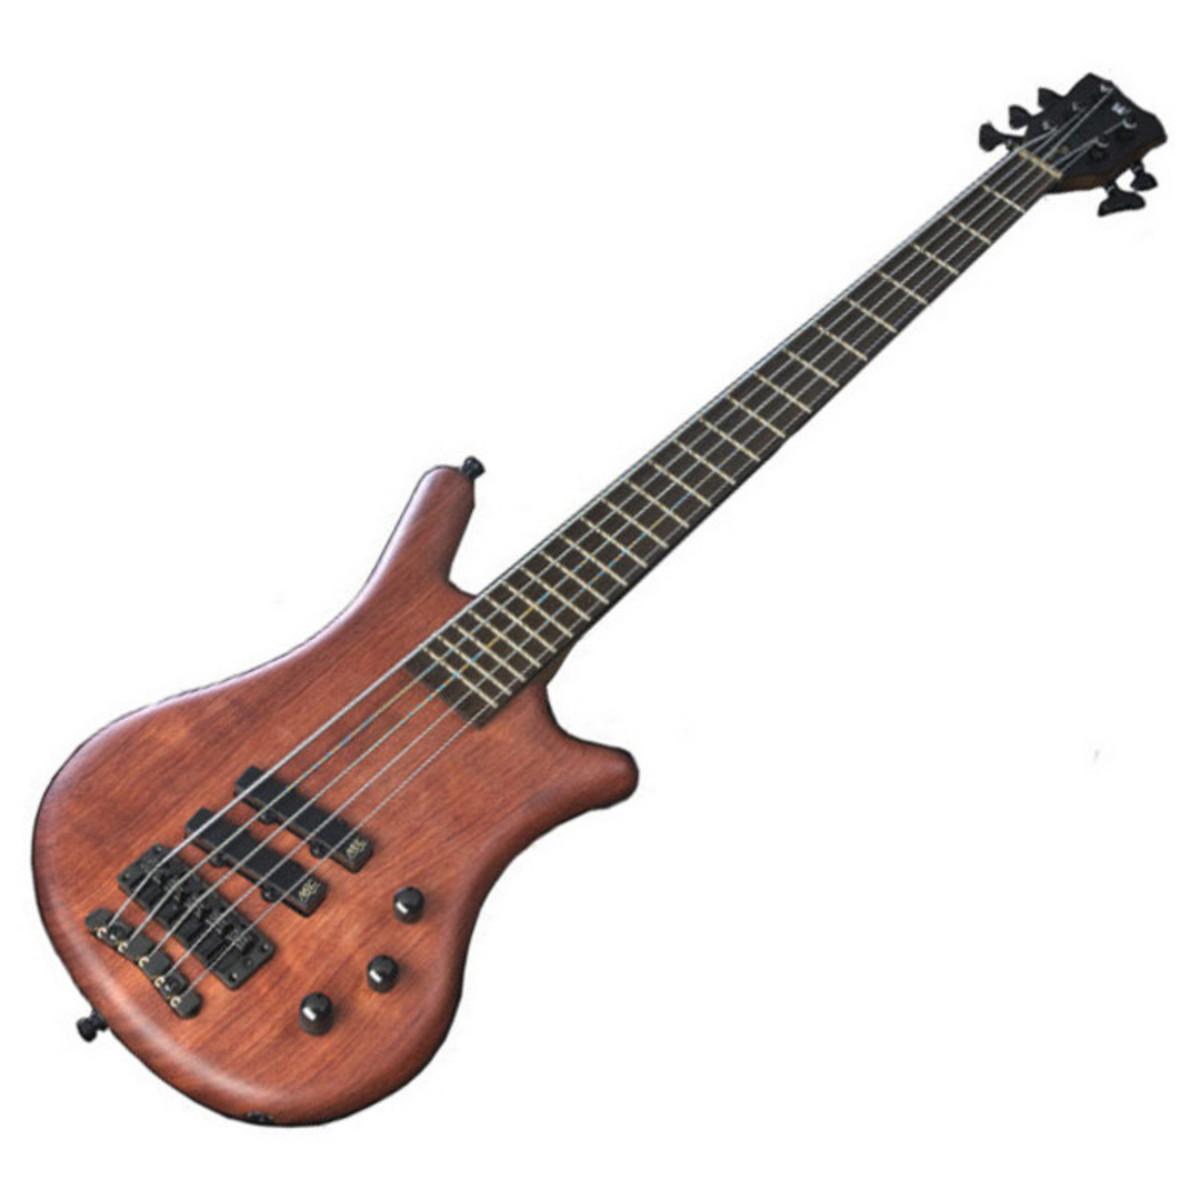 Warick bass thumb bolt on case